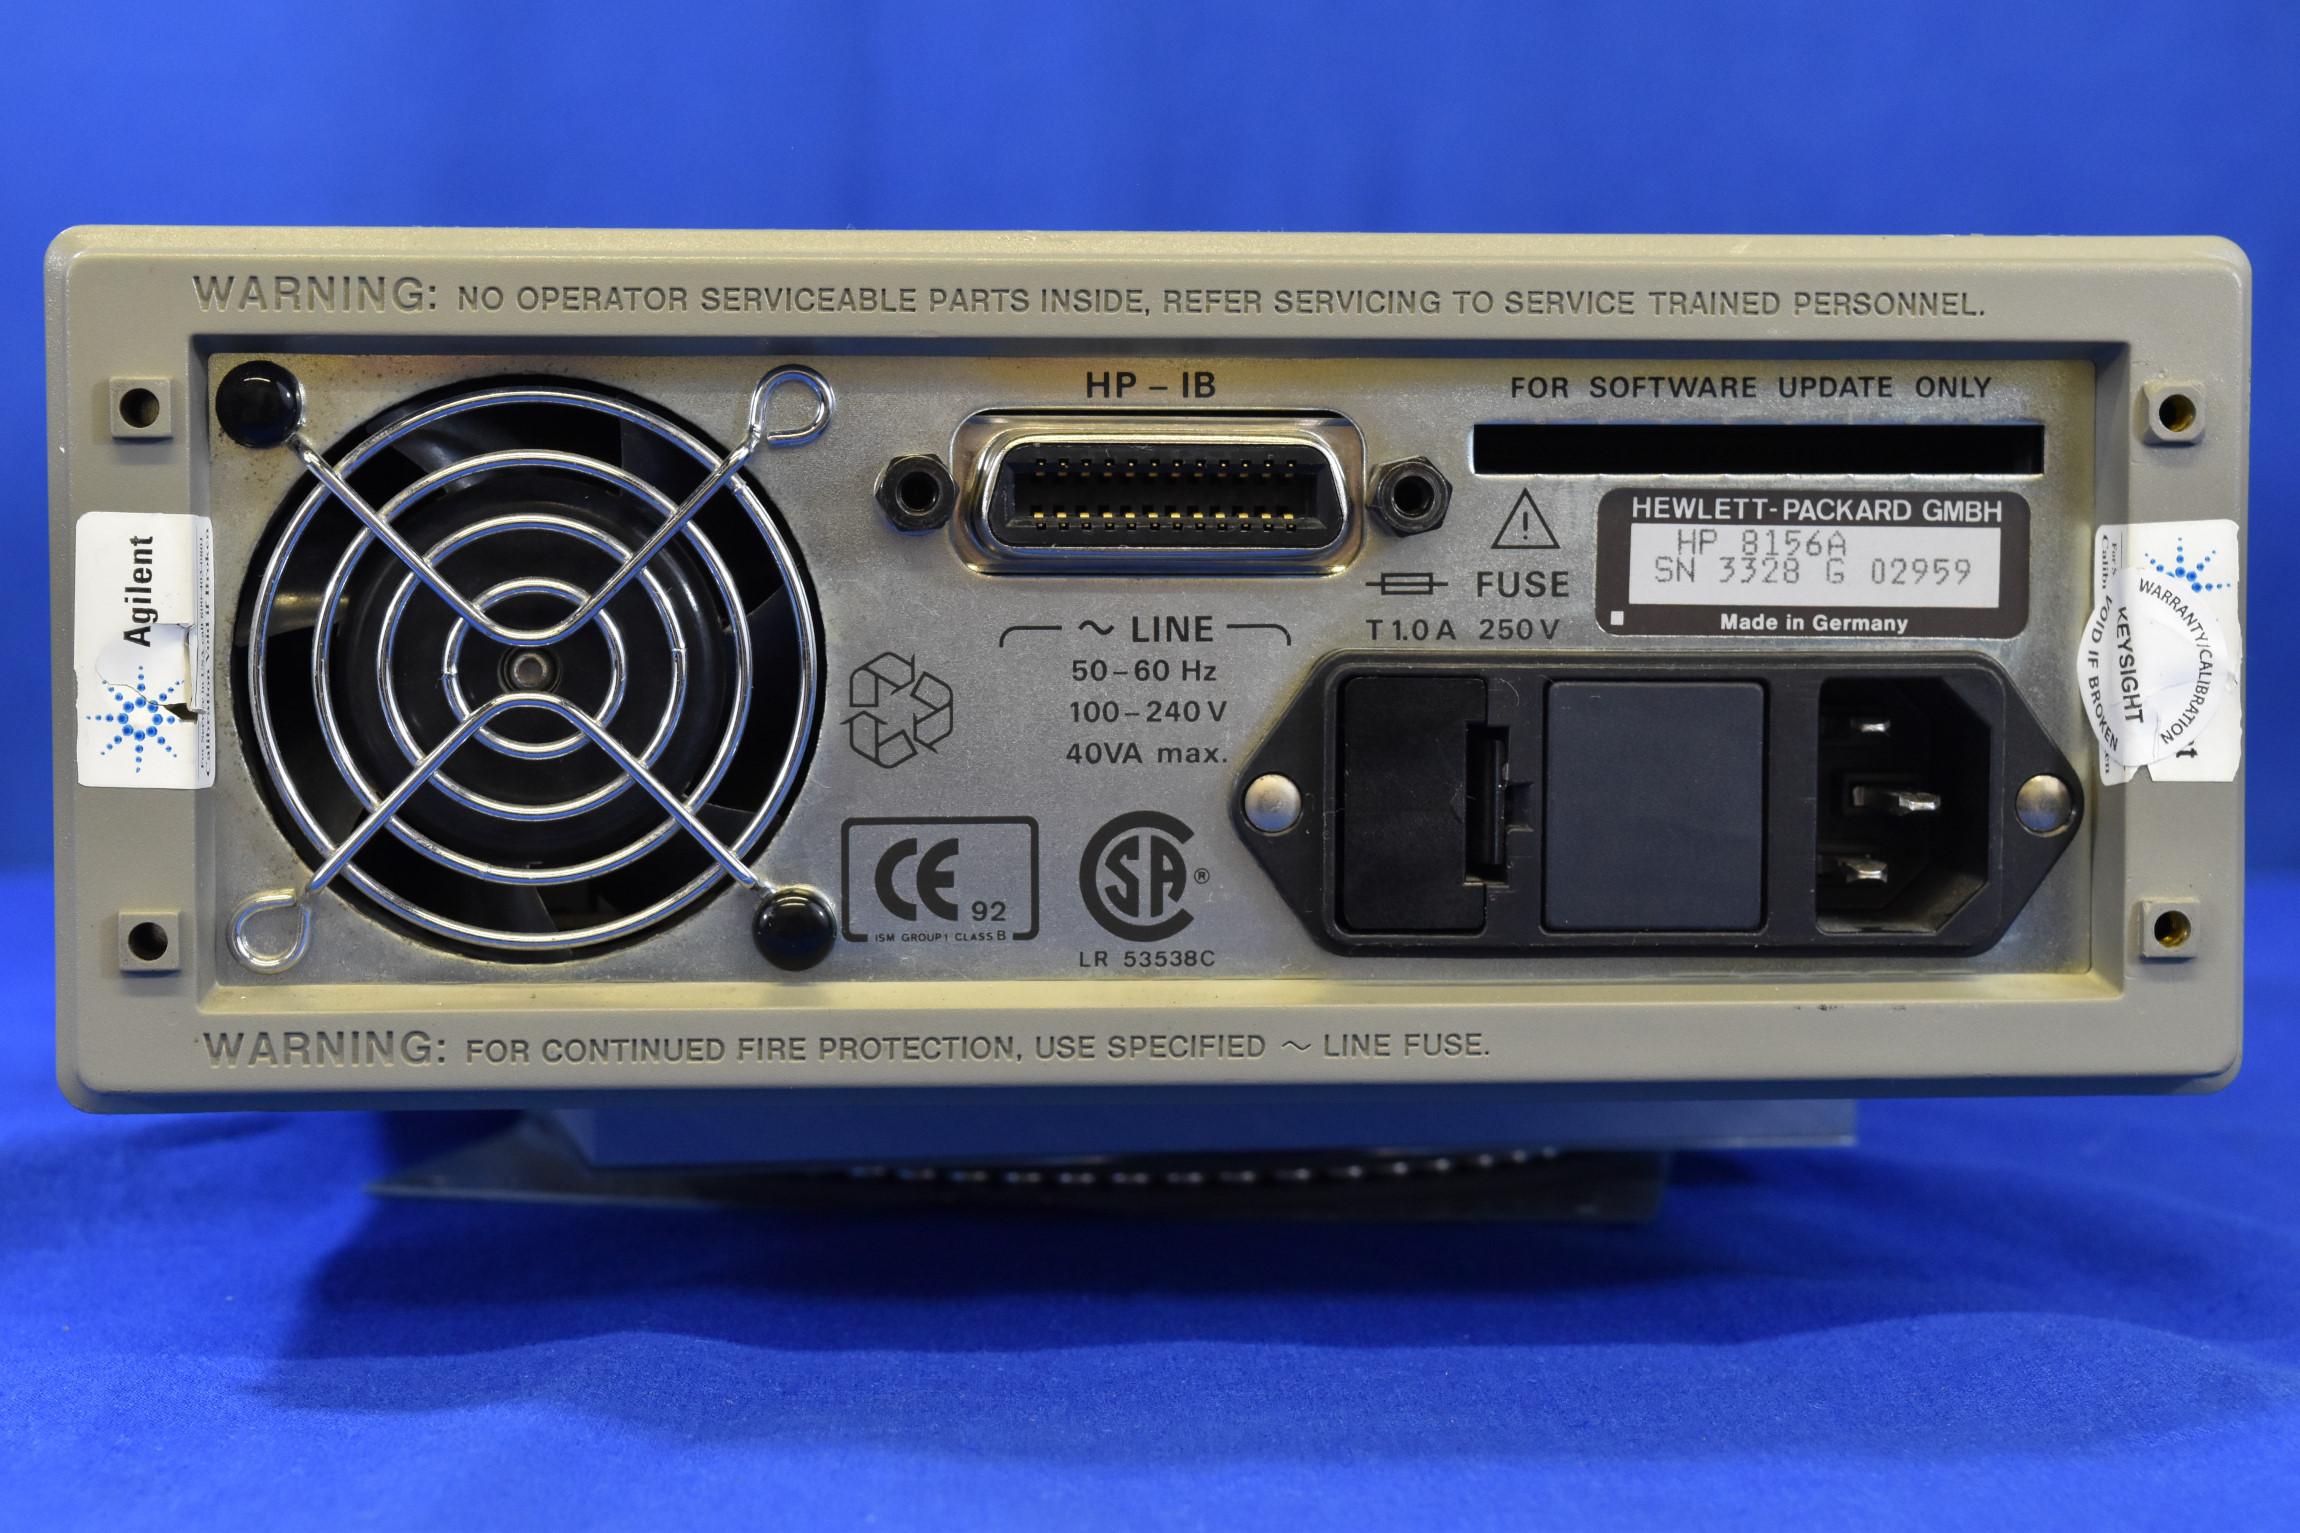 SN 590_006